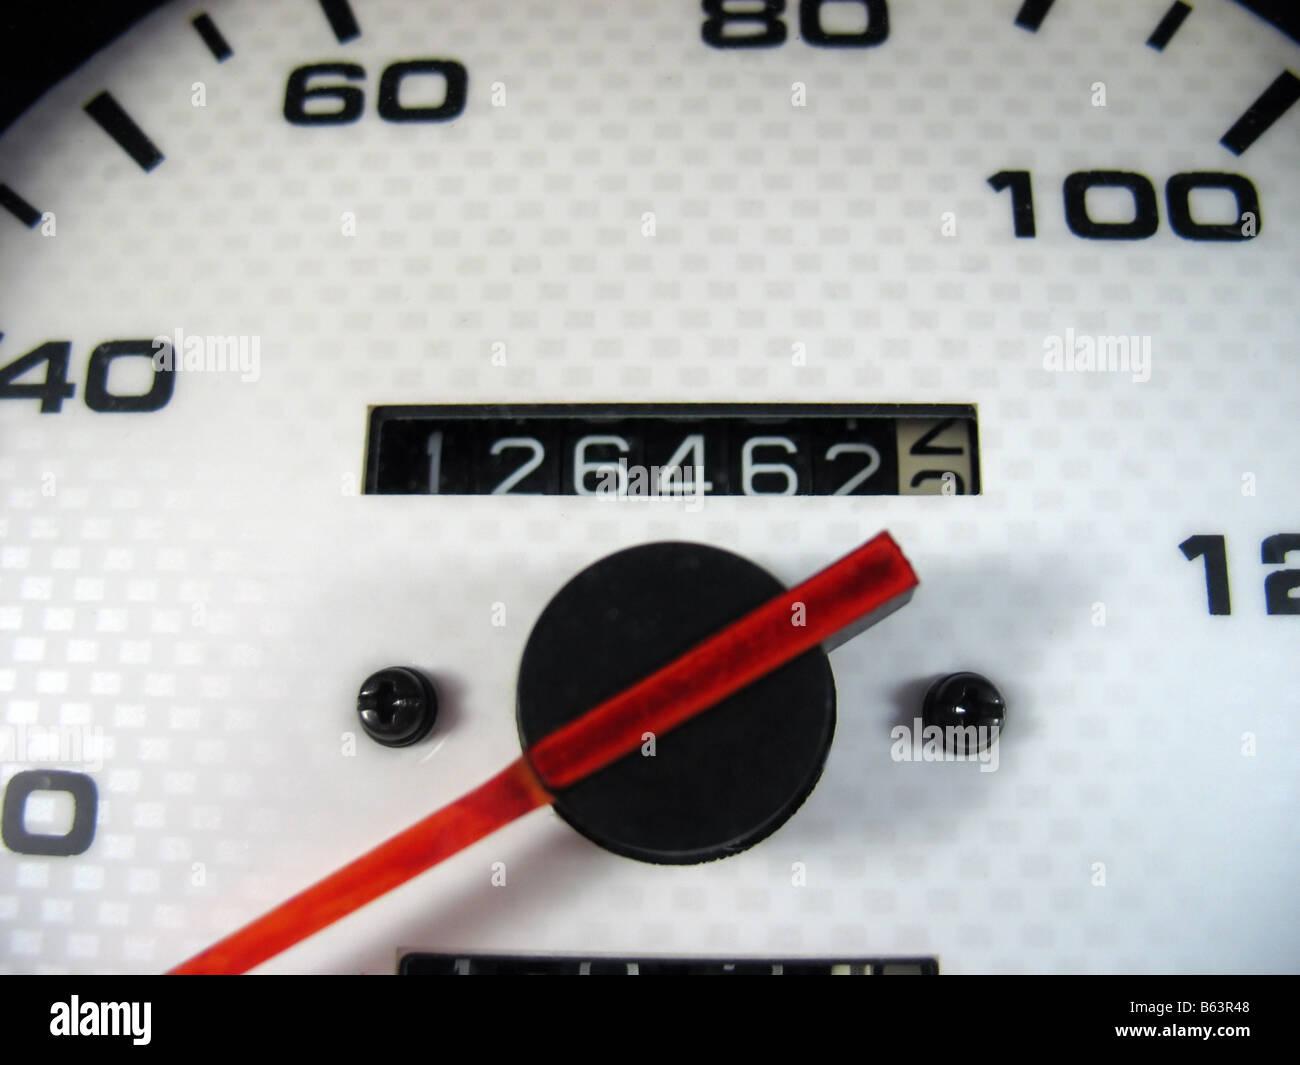 Odometer Mileage Stock Photos & Odometer Mileage Stock Images - Alamy